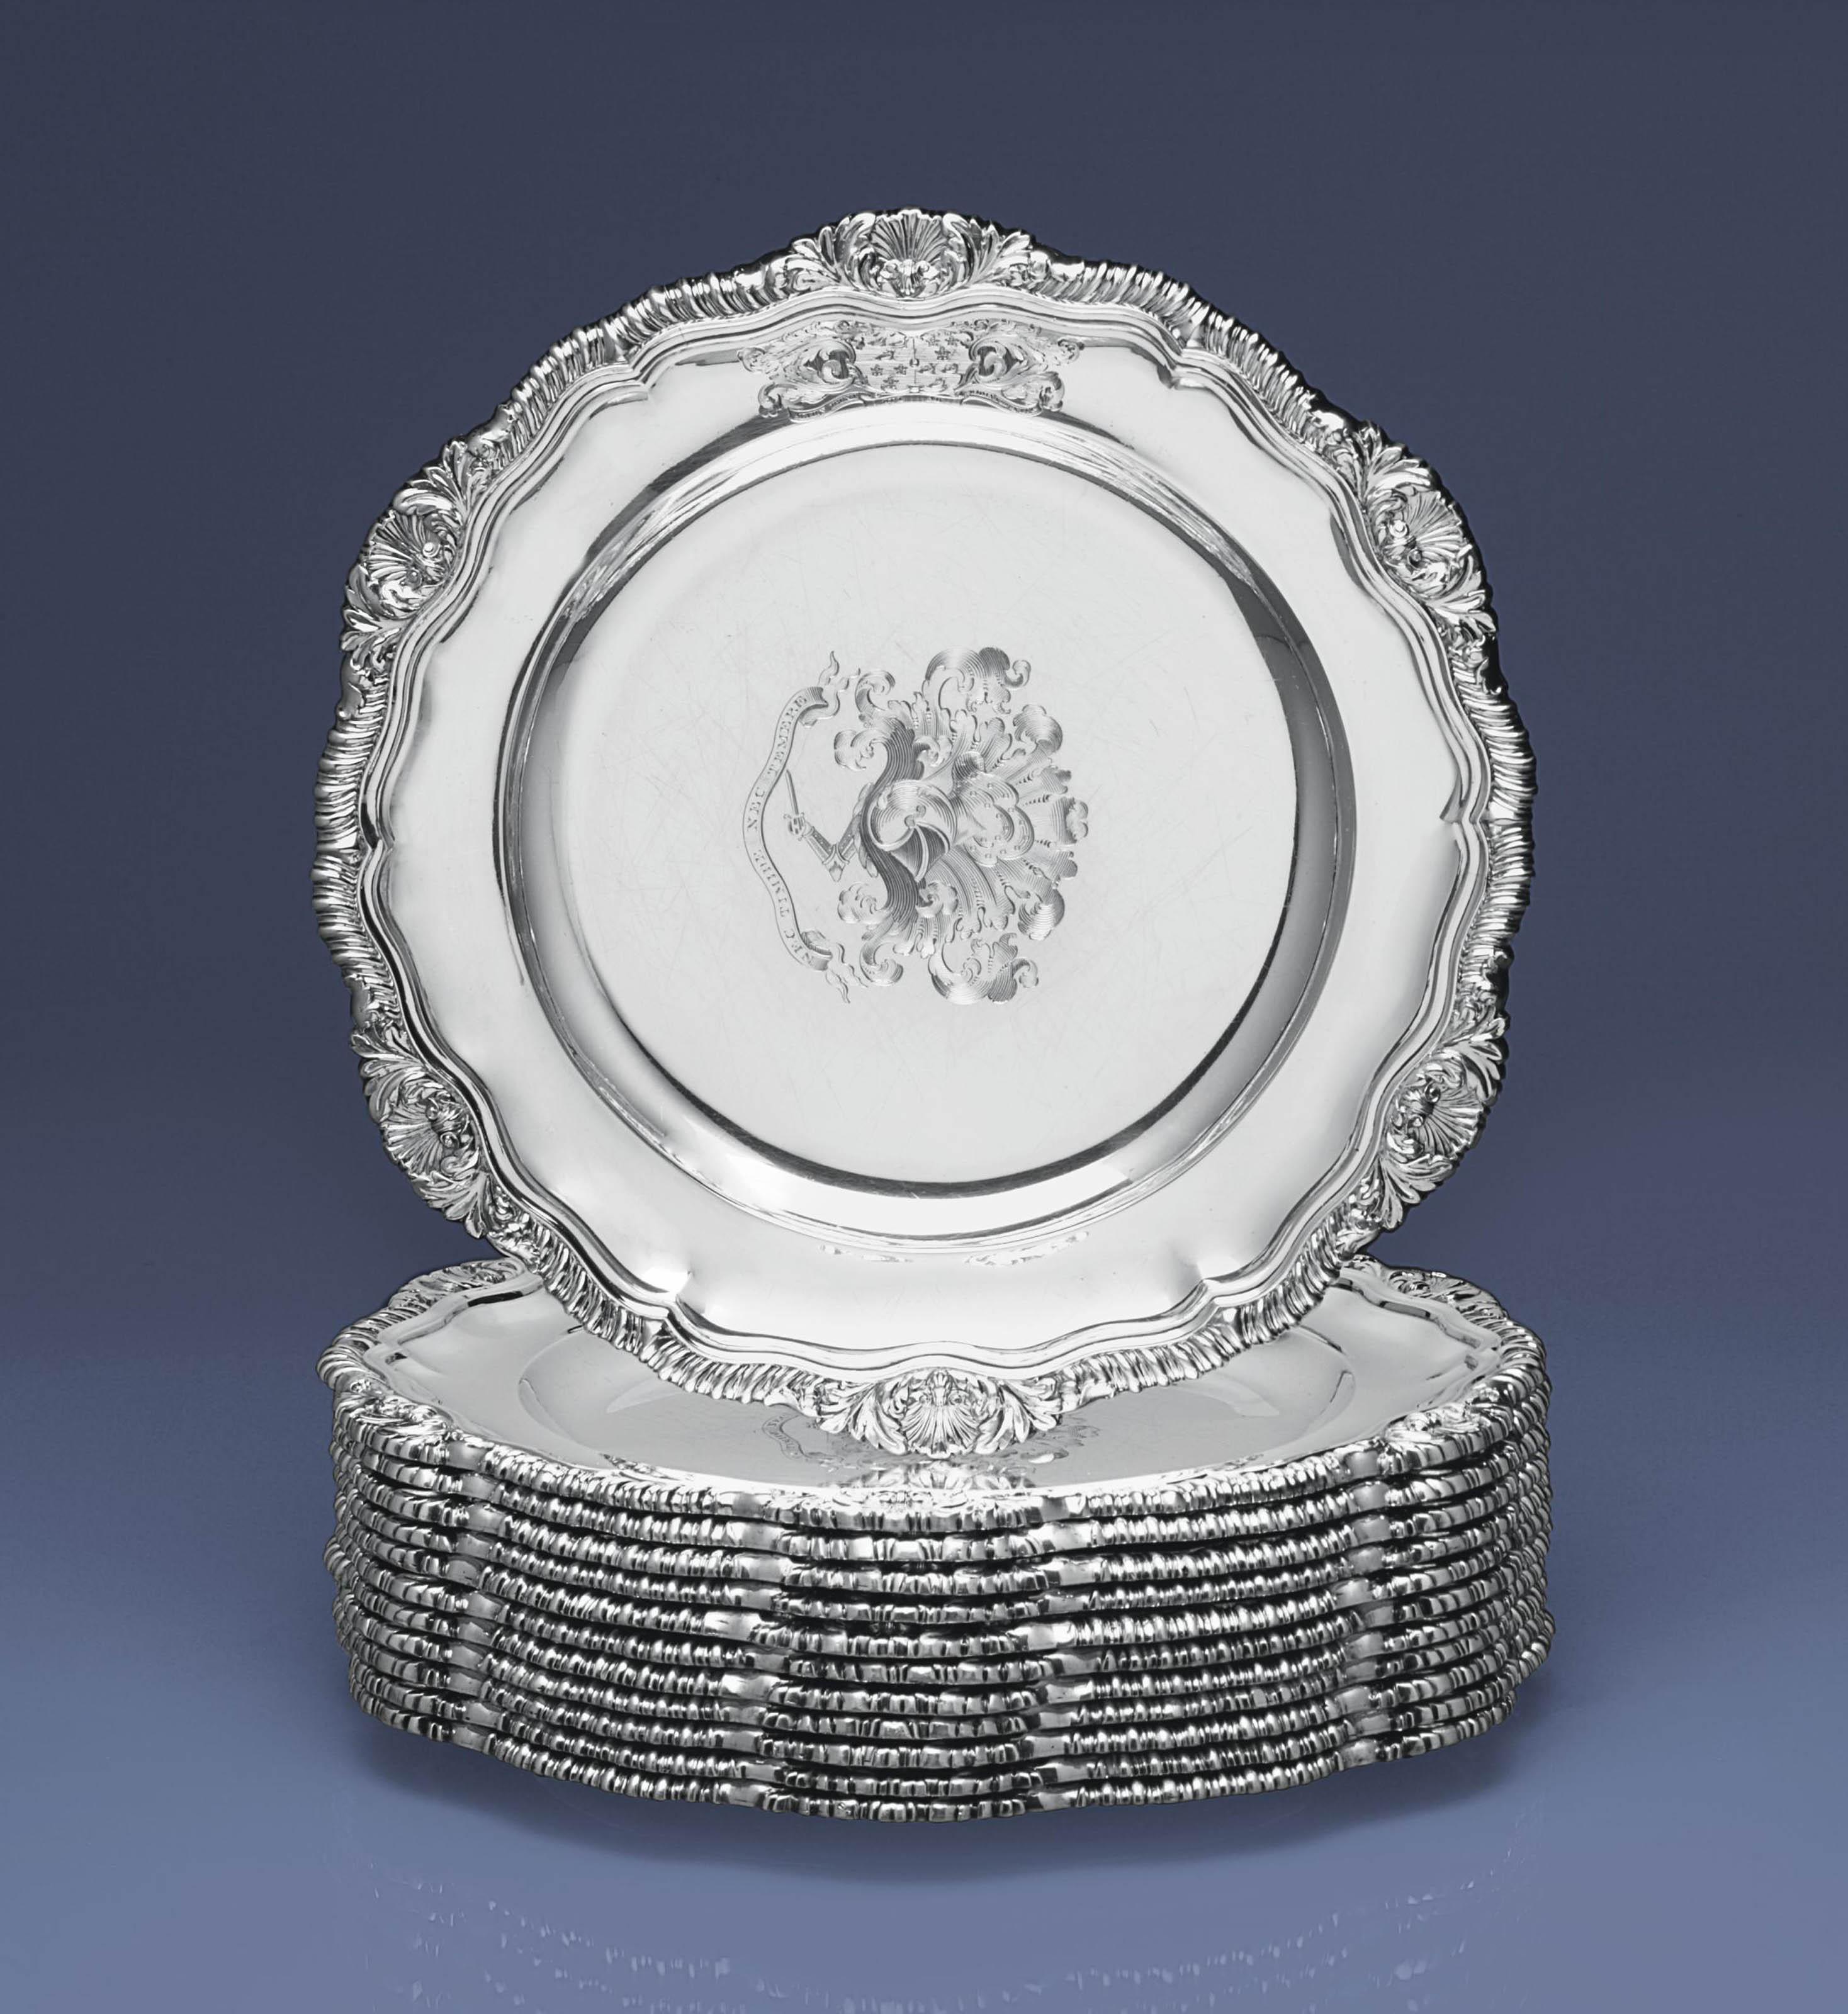 A SET OF TWELVE WILLIAM IV SILVER DINNER PLATES